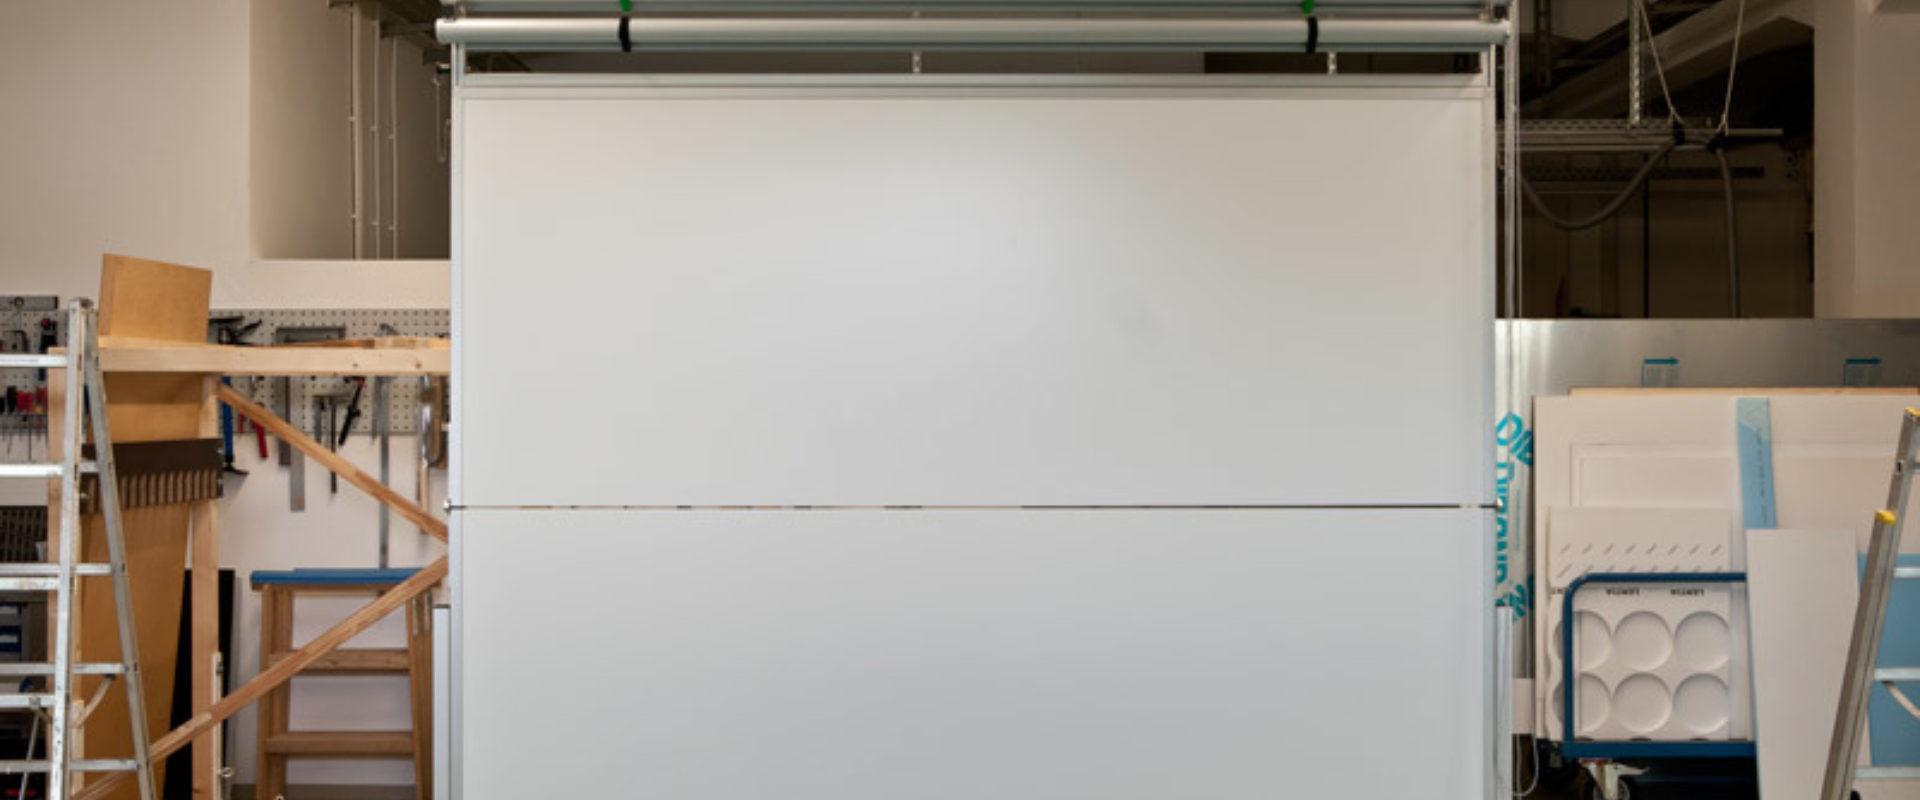 Horizontal klappbare Tafel mit Planungsfolienrollos